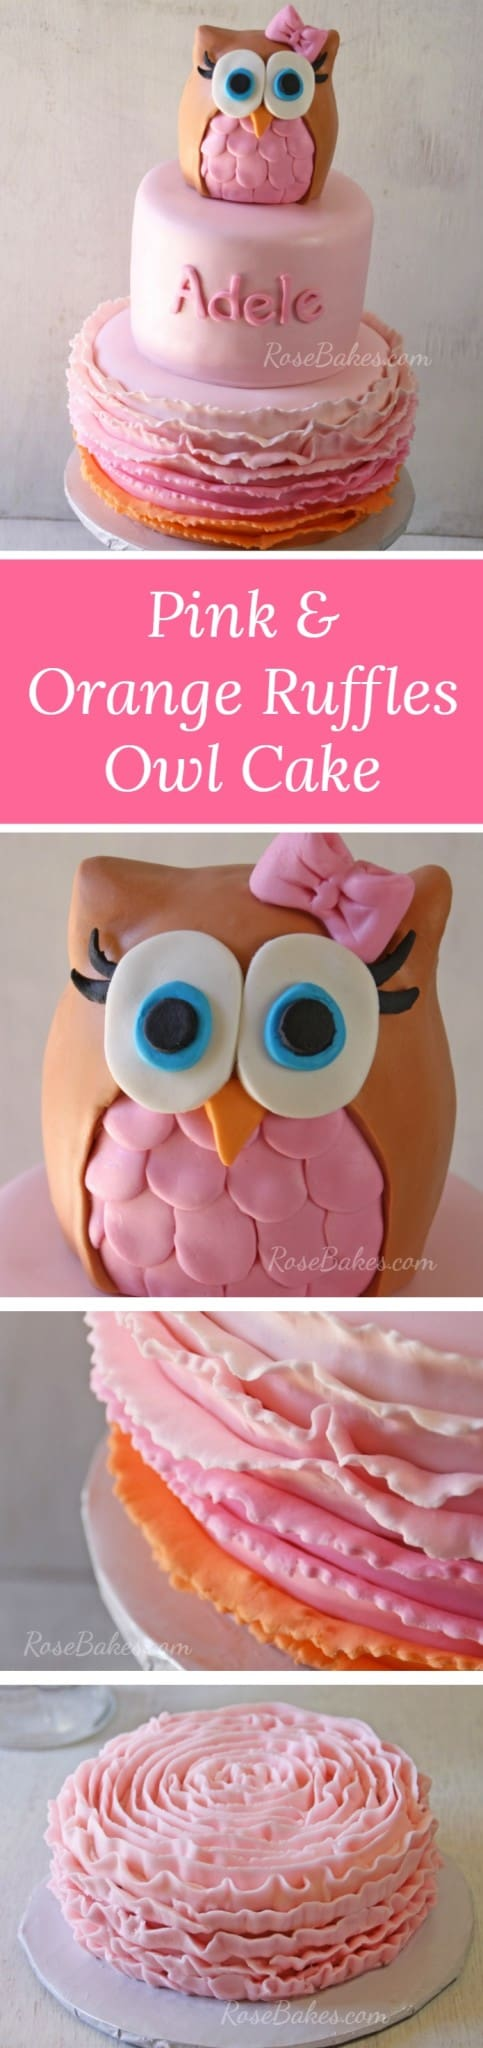 Pink & Orange Ruffles Owl Cake RoseBakes